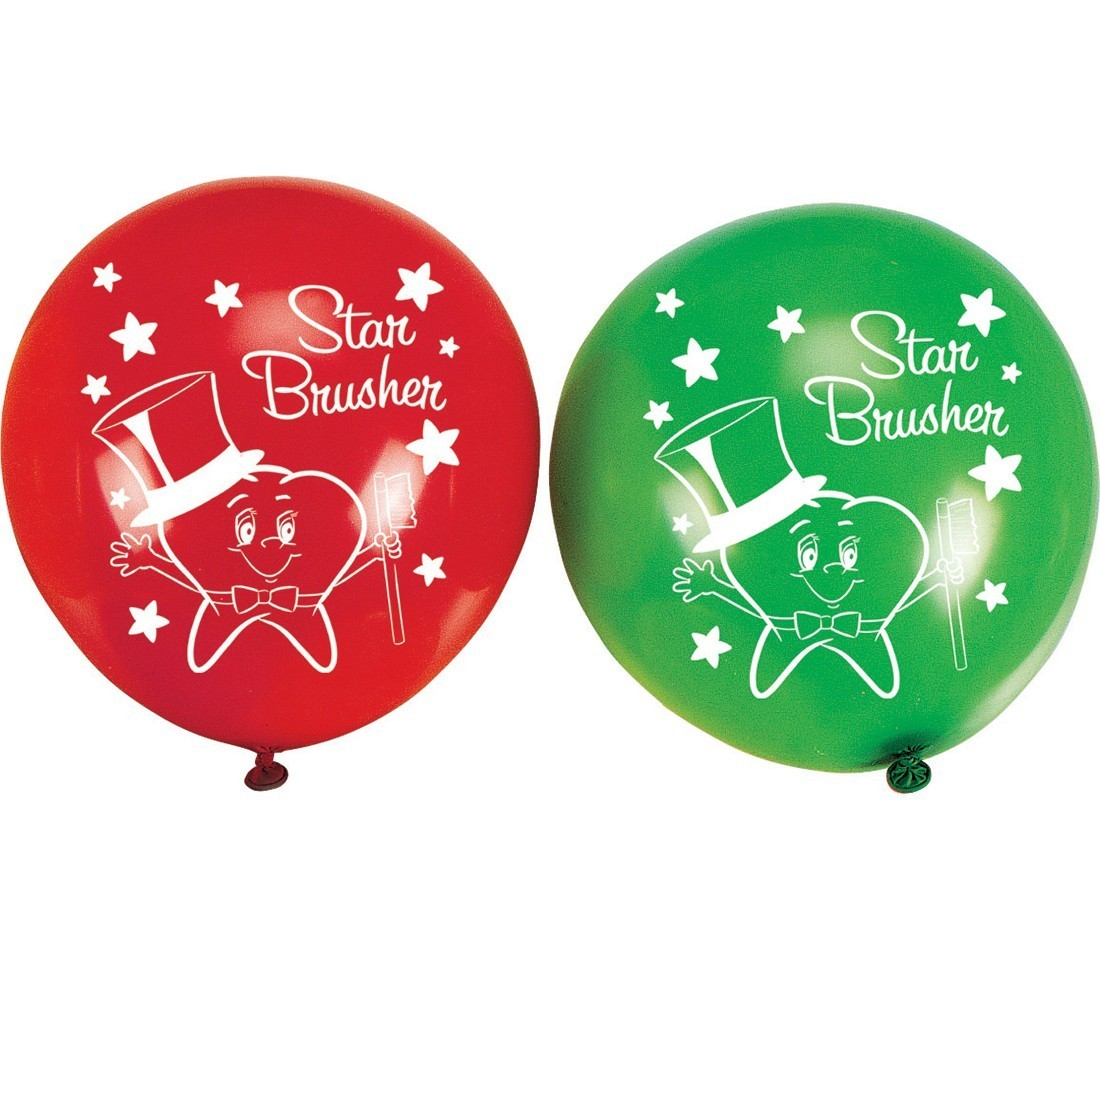 Star Brusher Latex Balloons [image]